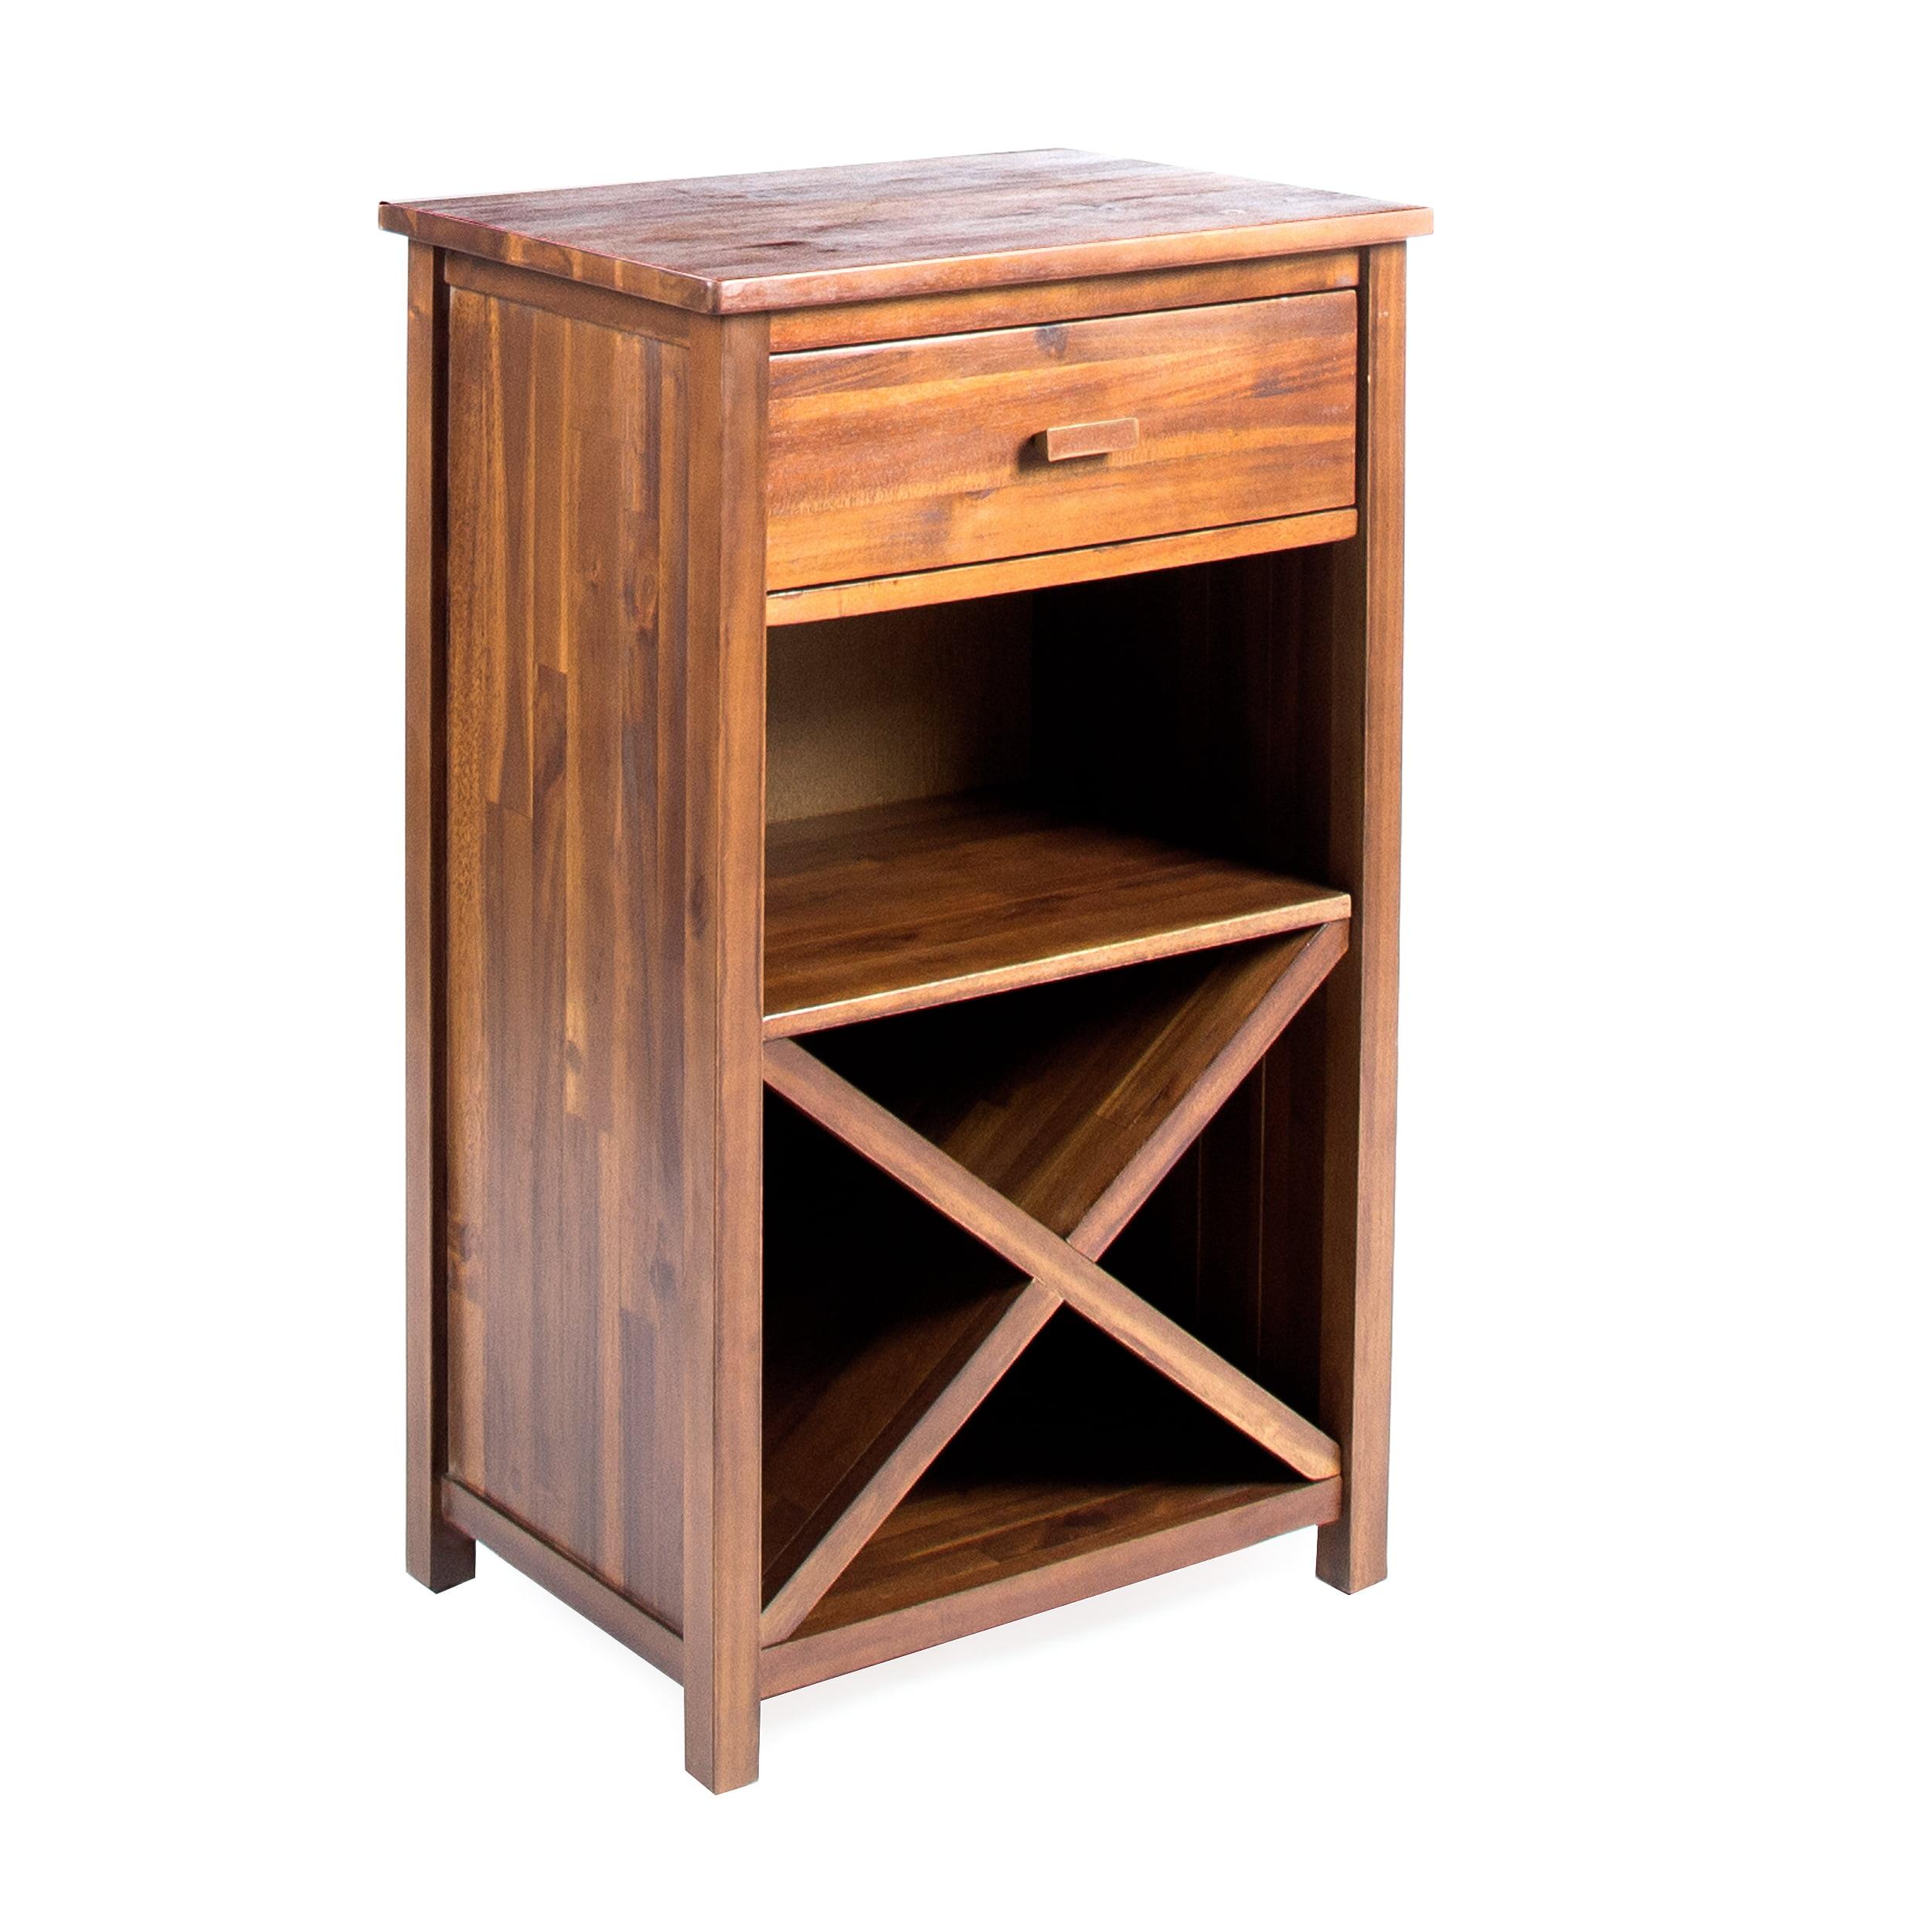 Clover Farmhouse Acacia Wood Bar Cabinet, Dark Oak